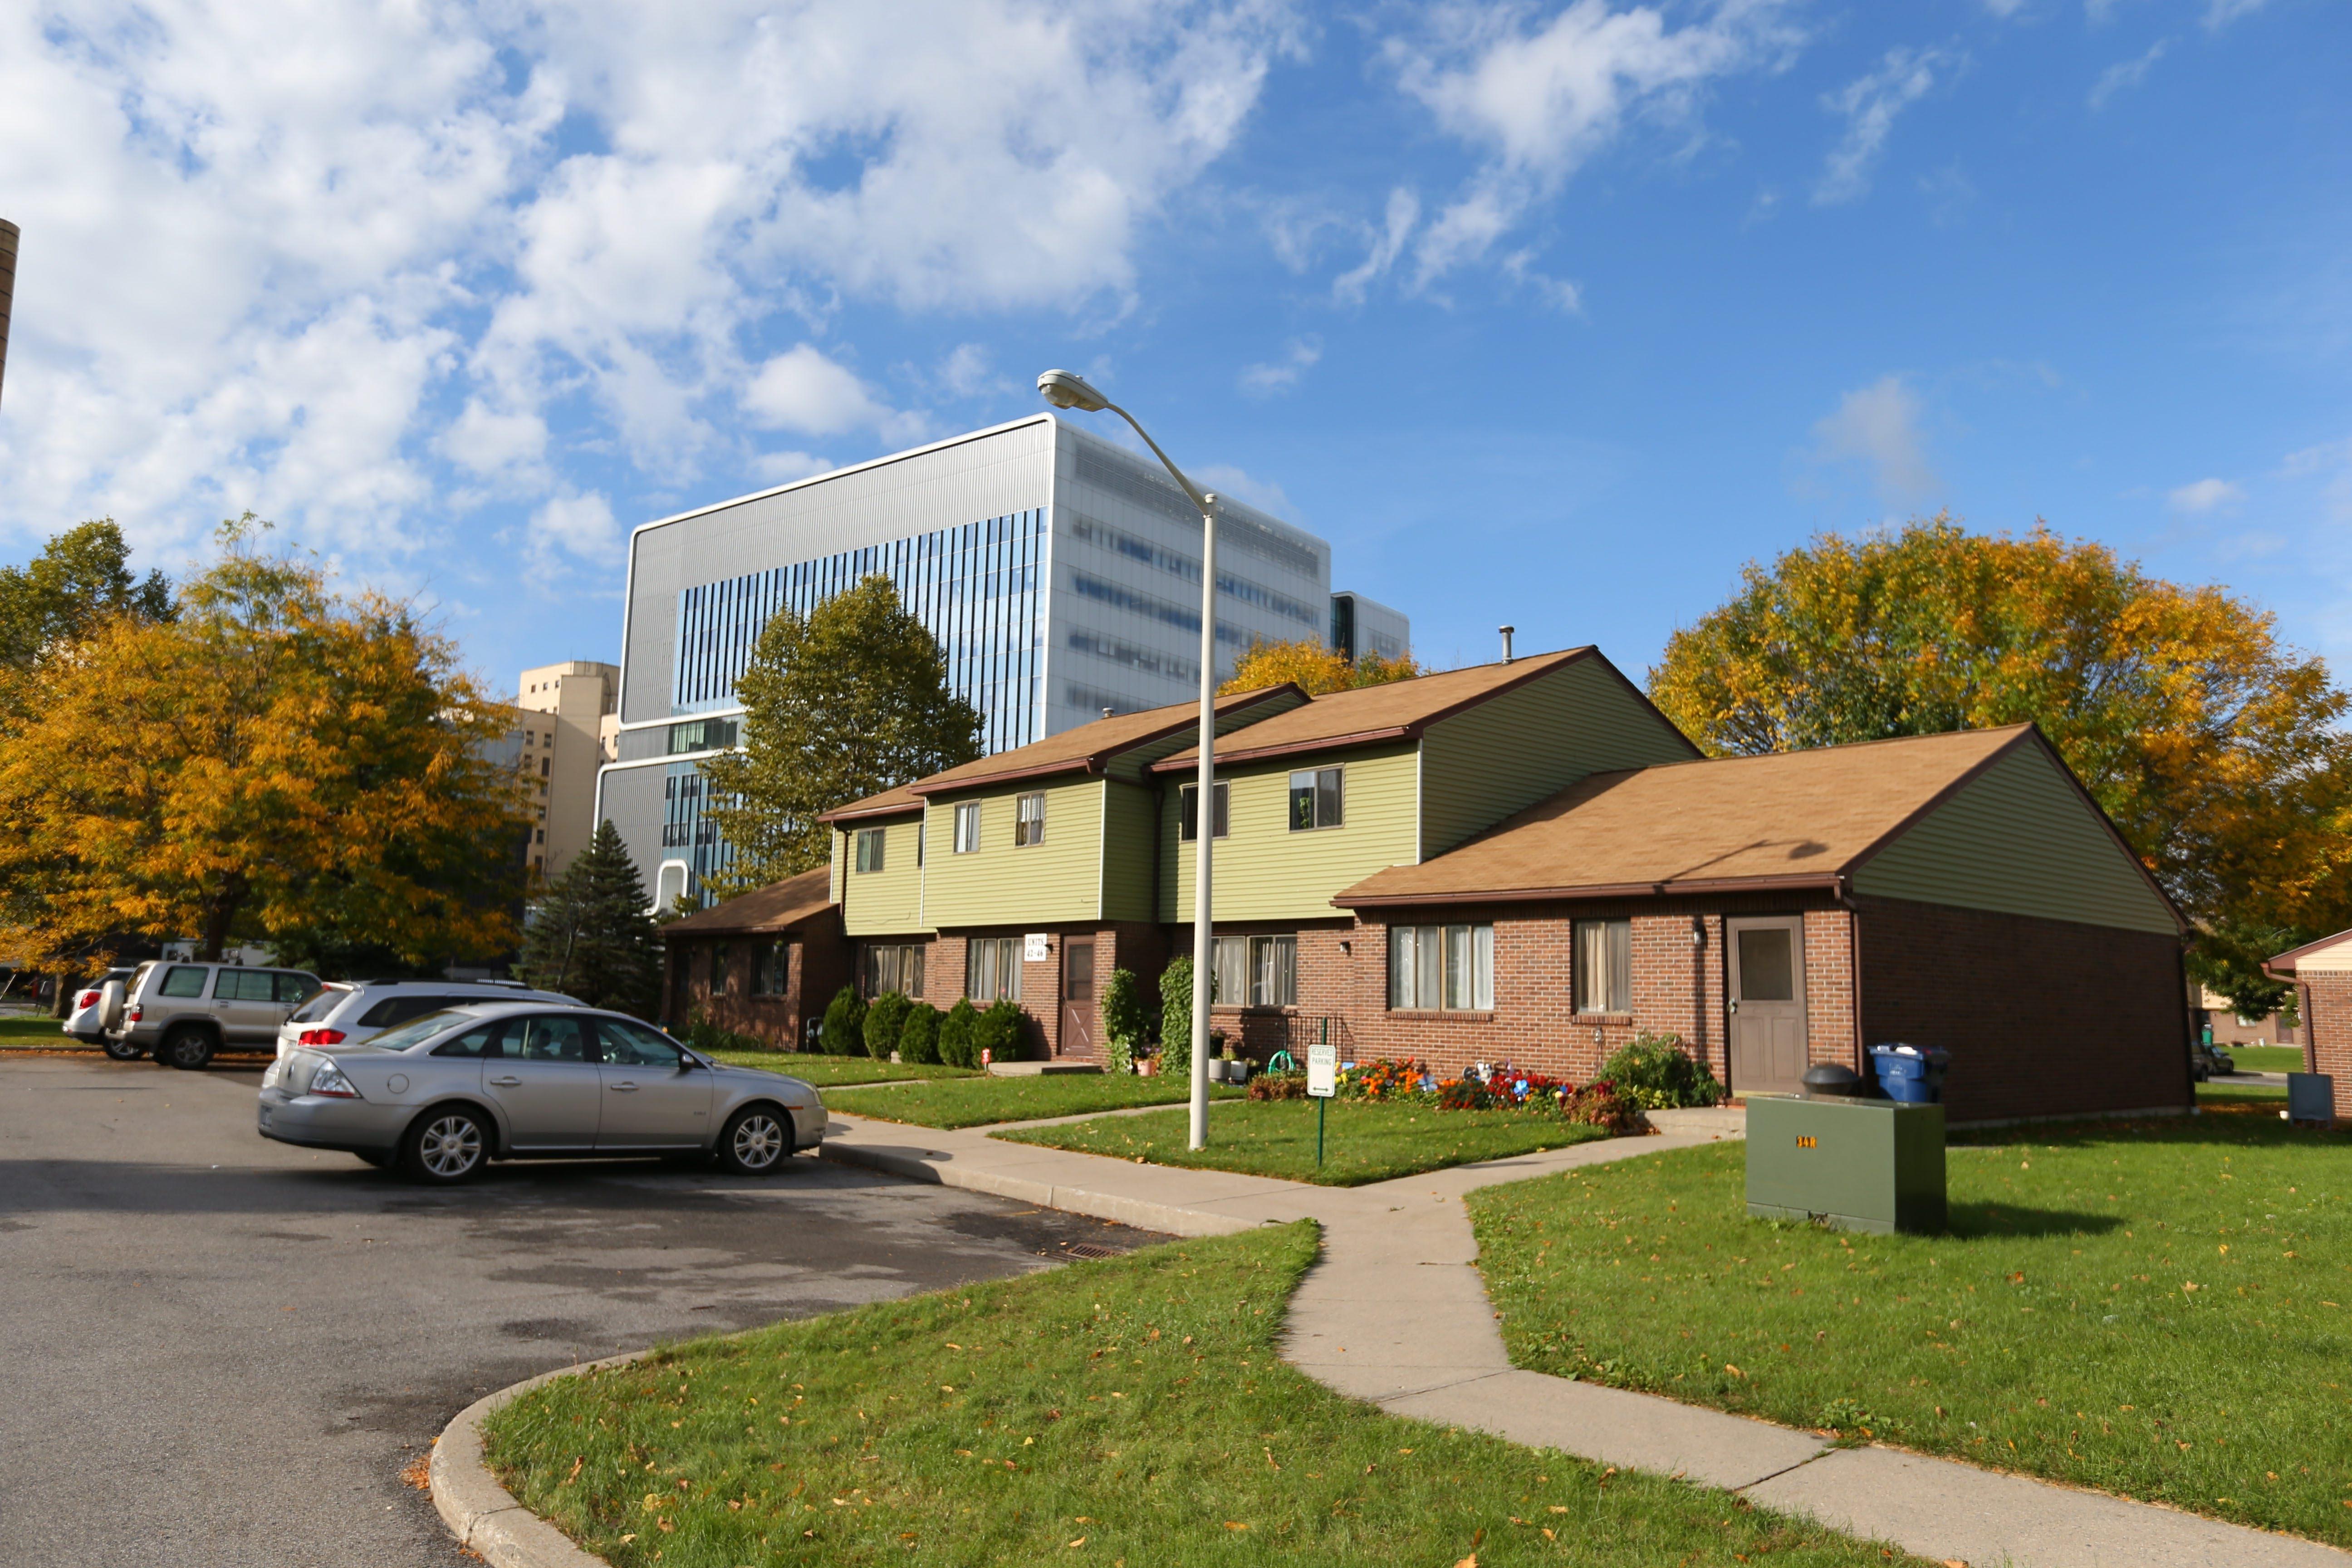 The garden-style Pilgrim Village Apartments near Buffalo Niagara Medical Campus will be renovated.